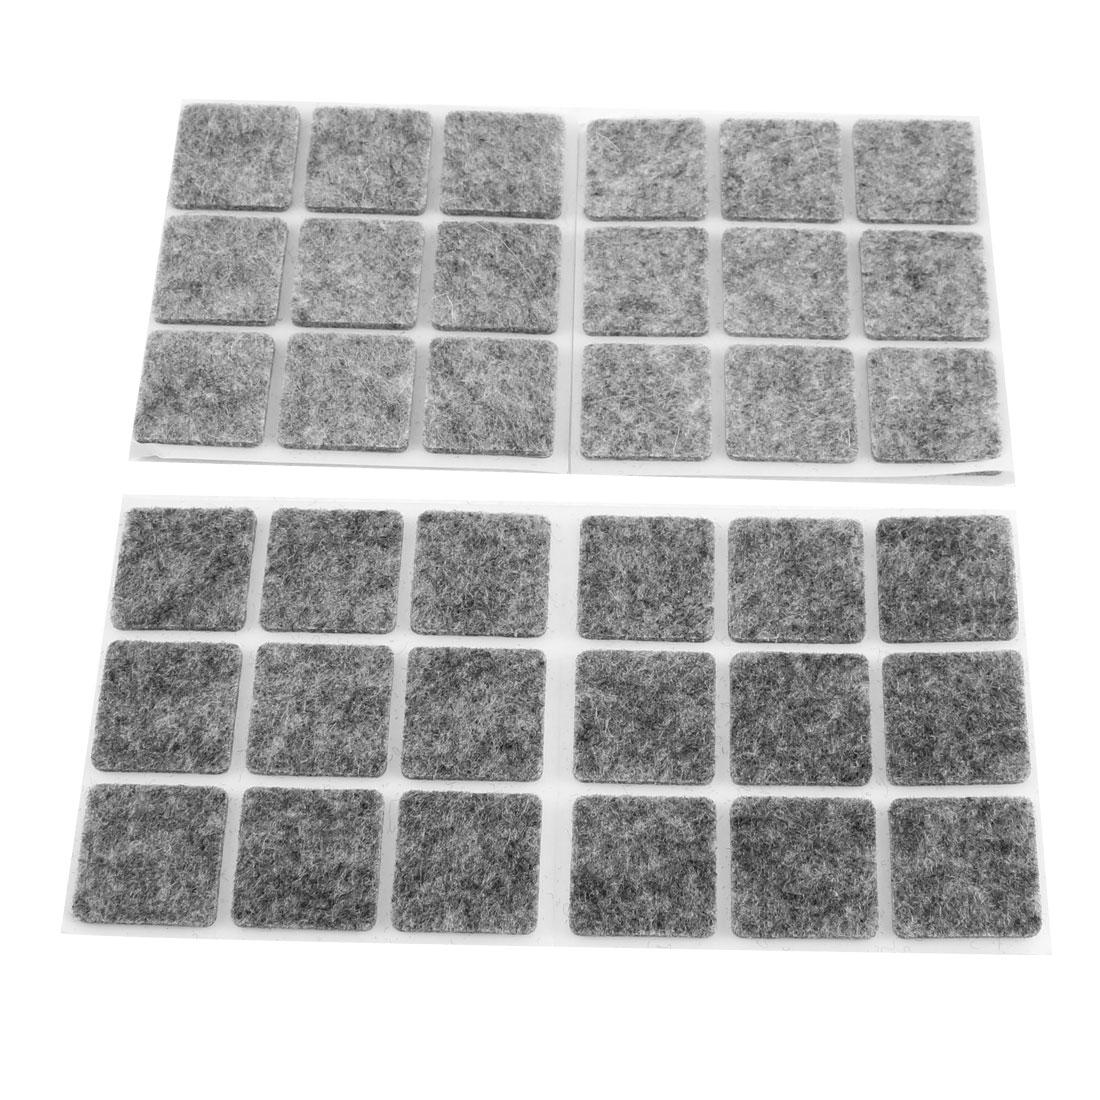 Furniture Antislip Adhesive Felt Floor Protector Pads 54 Pcs